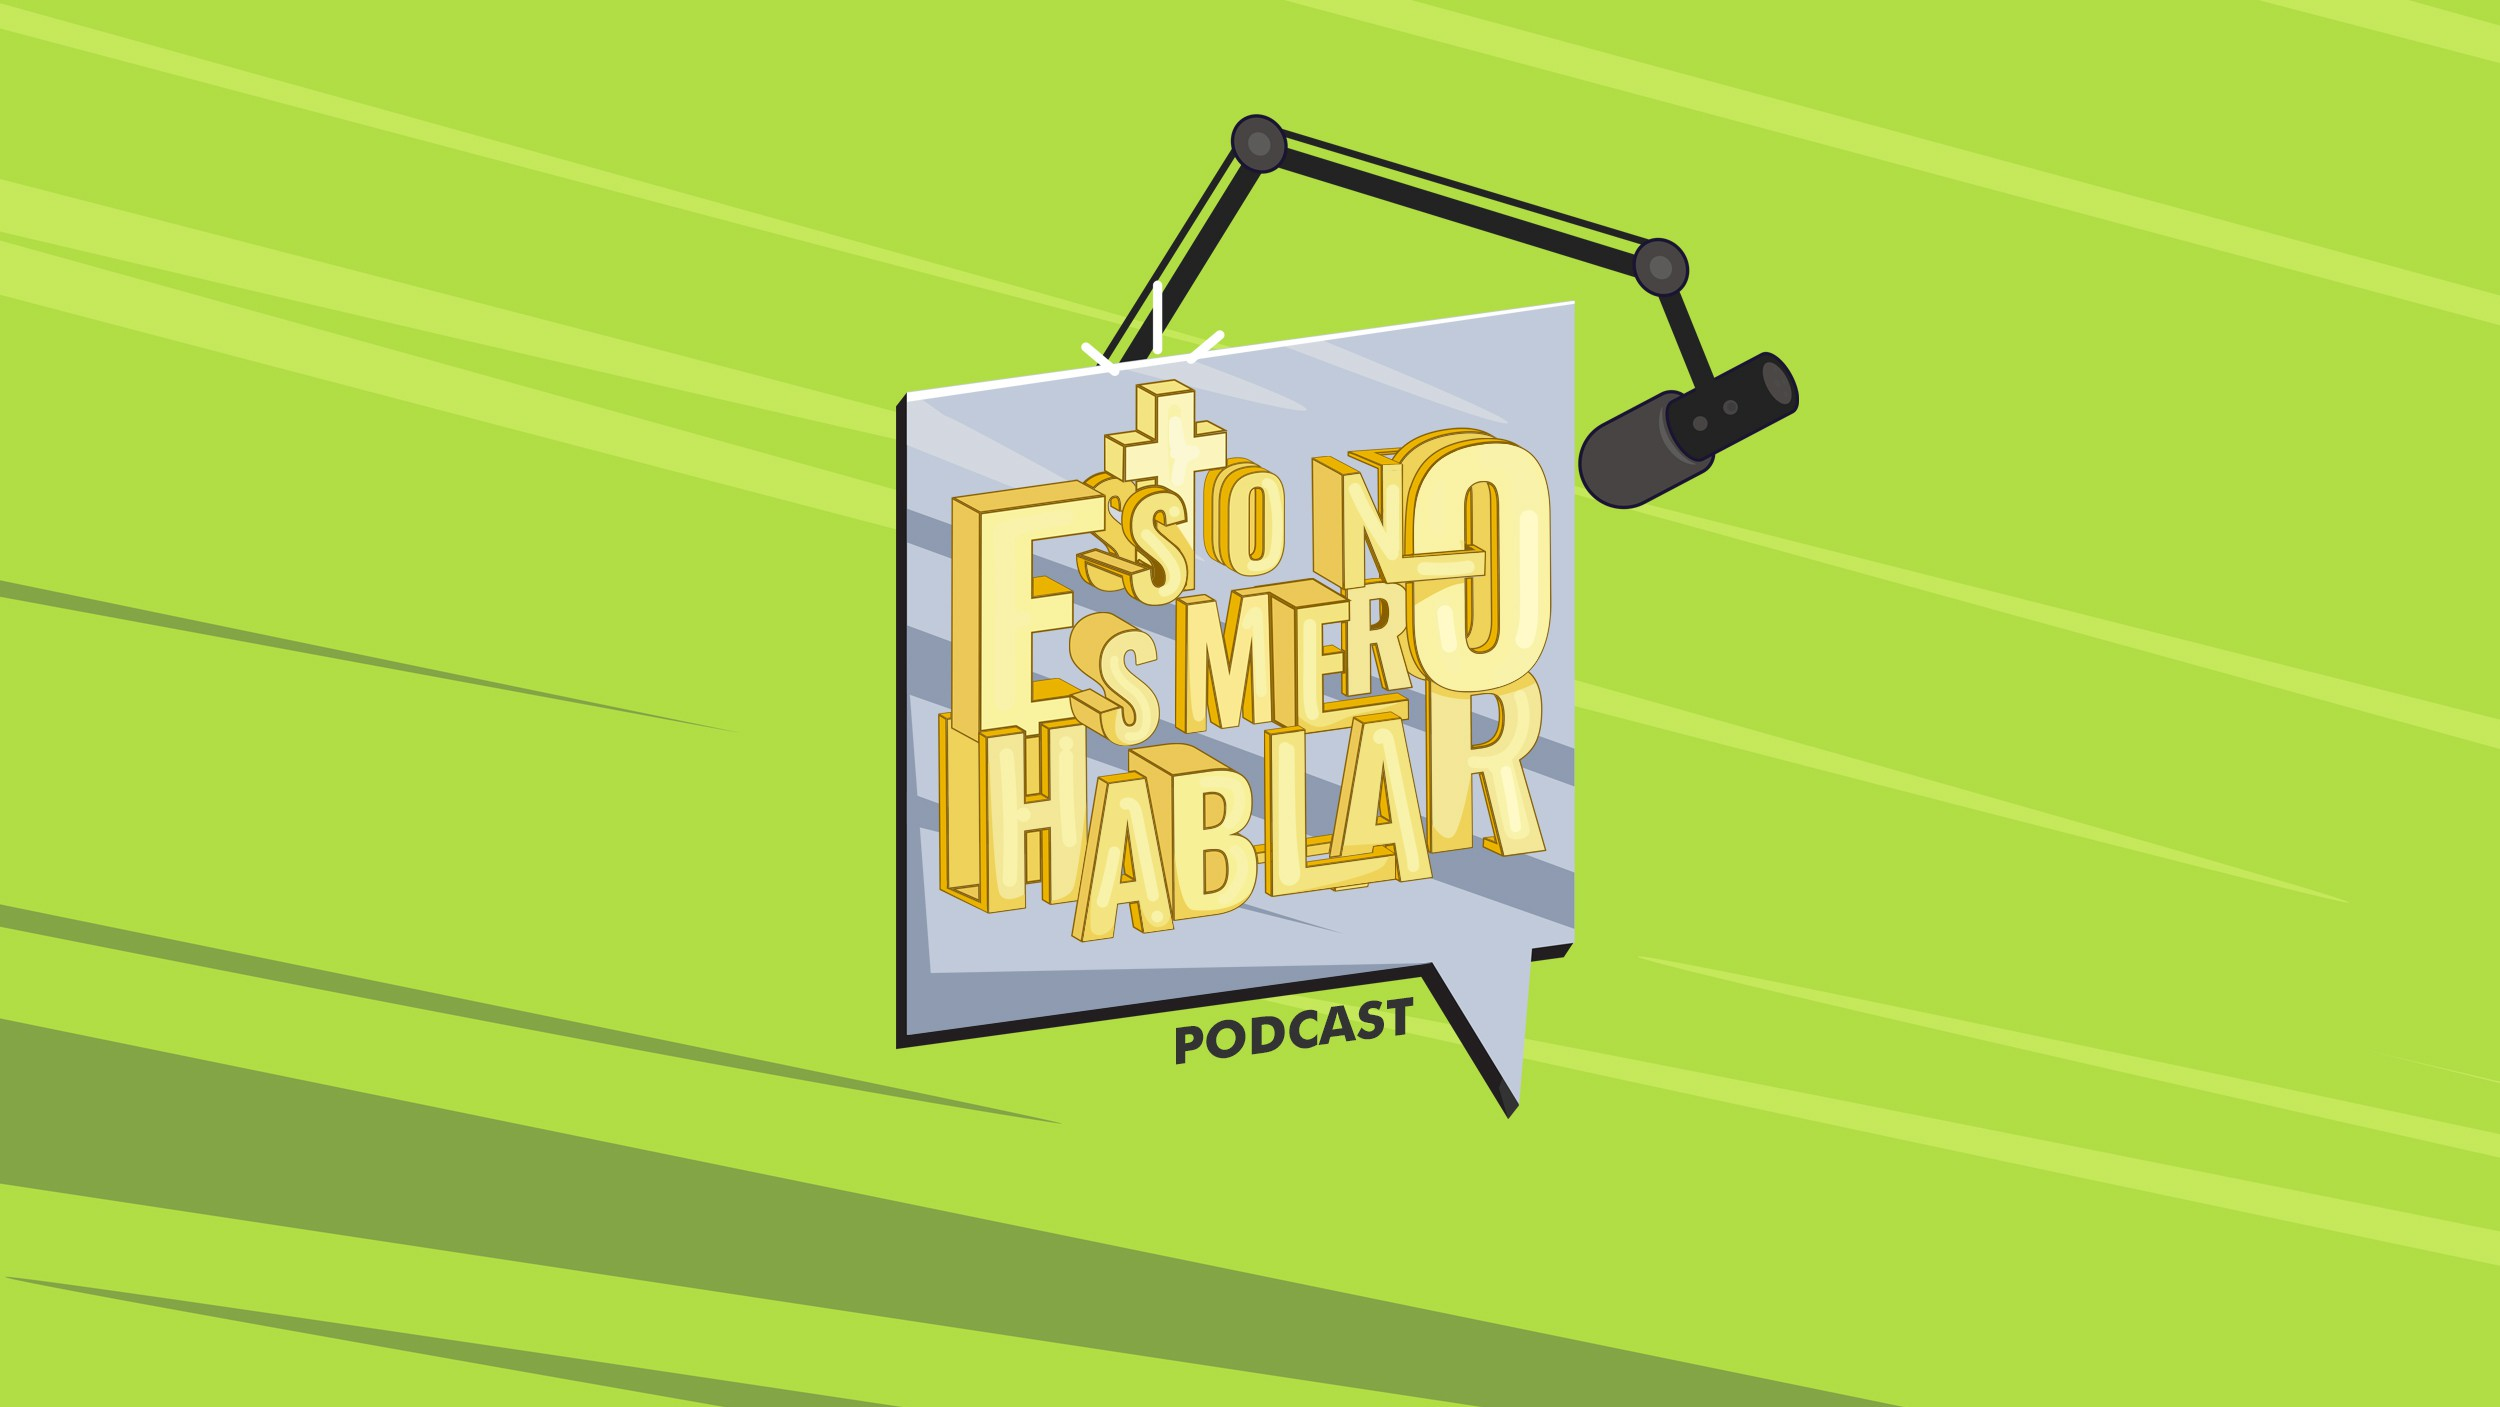 I'll create a new podcast cover (Esto no es mero hablar)